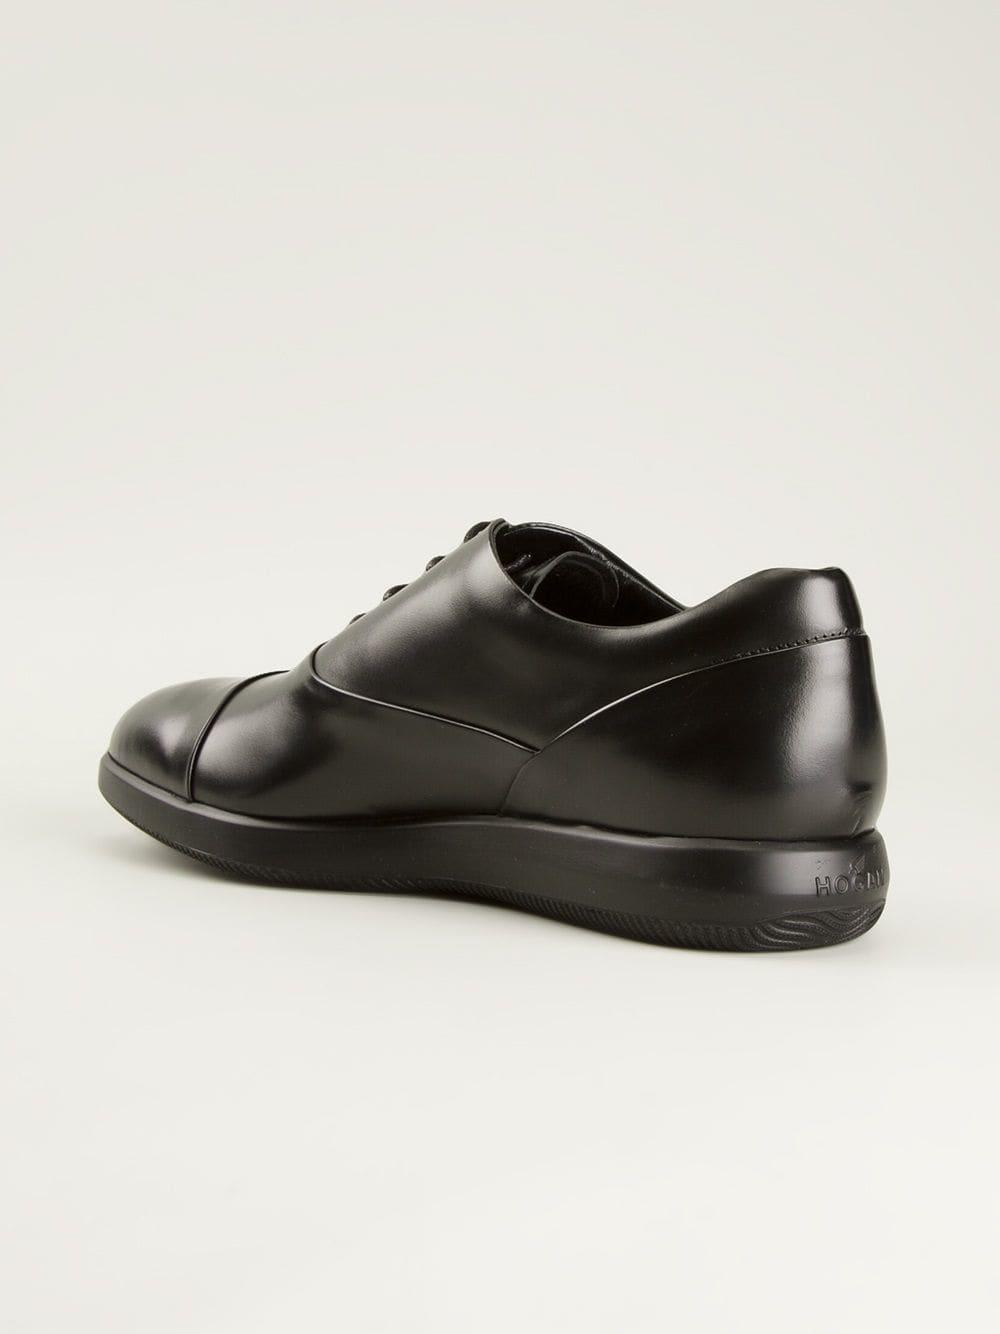 Hogan 'dress X-h209' Shoes in Black for Men - Lyst